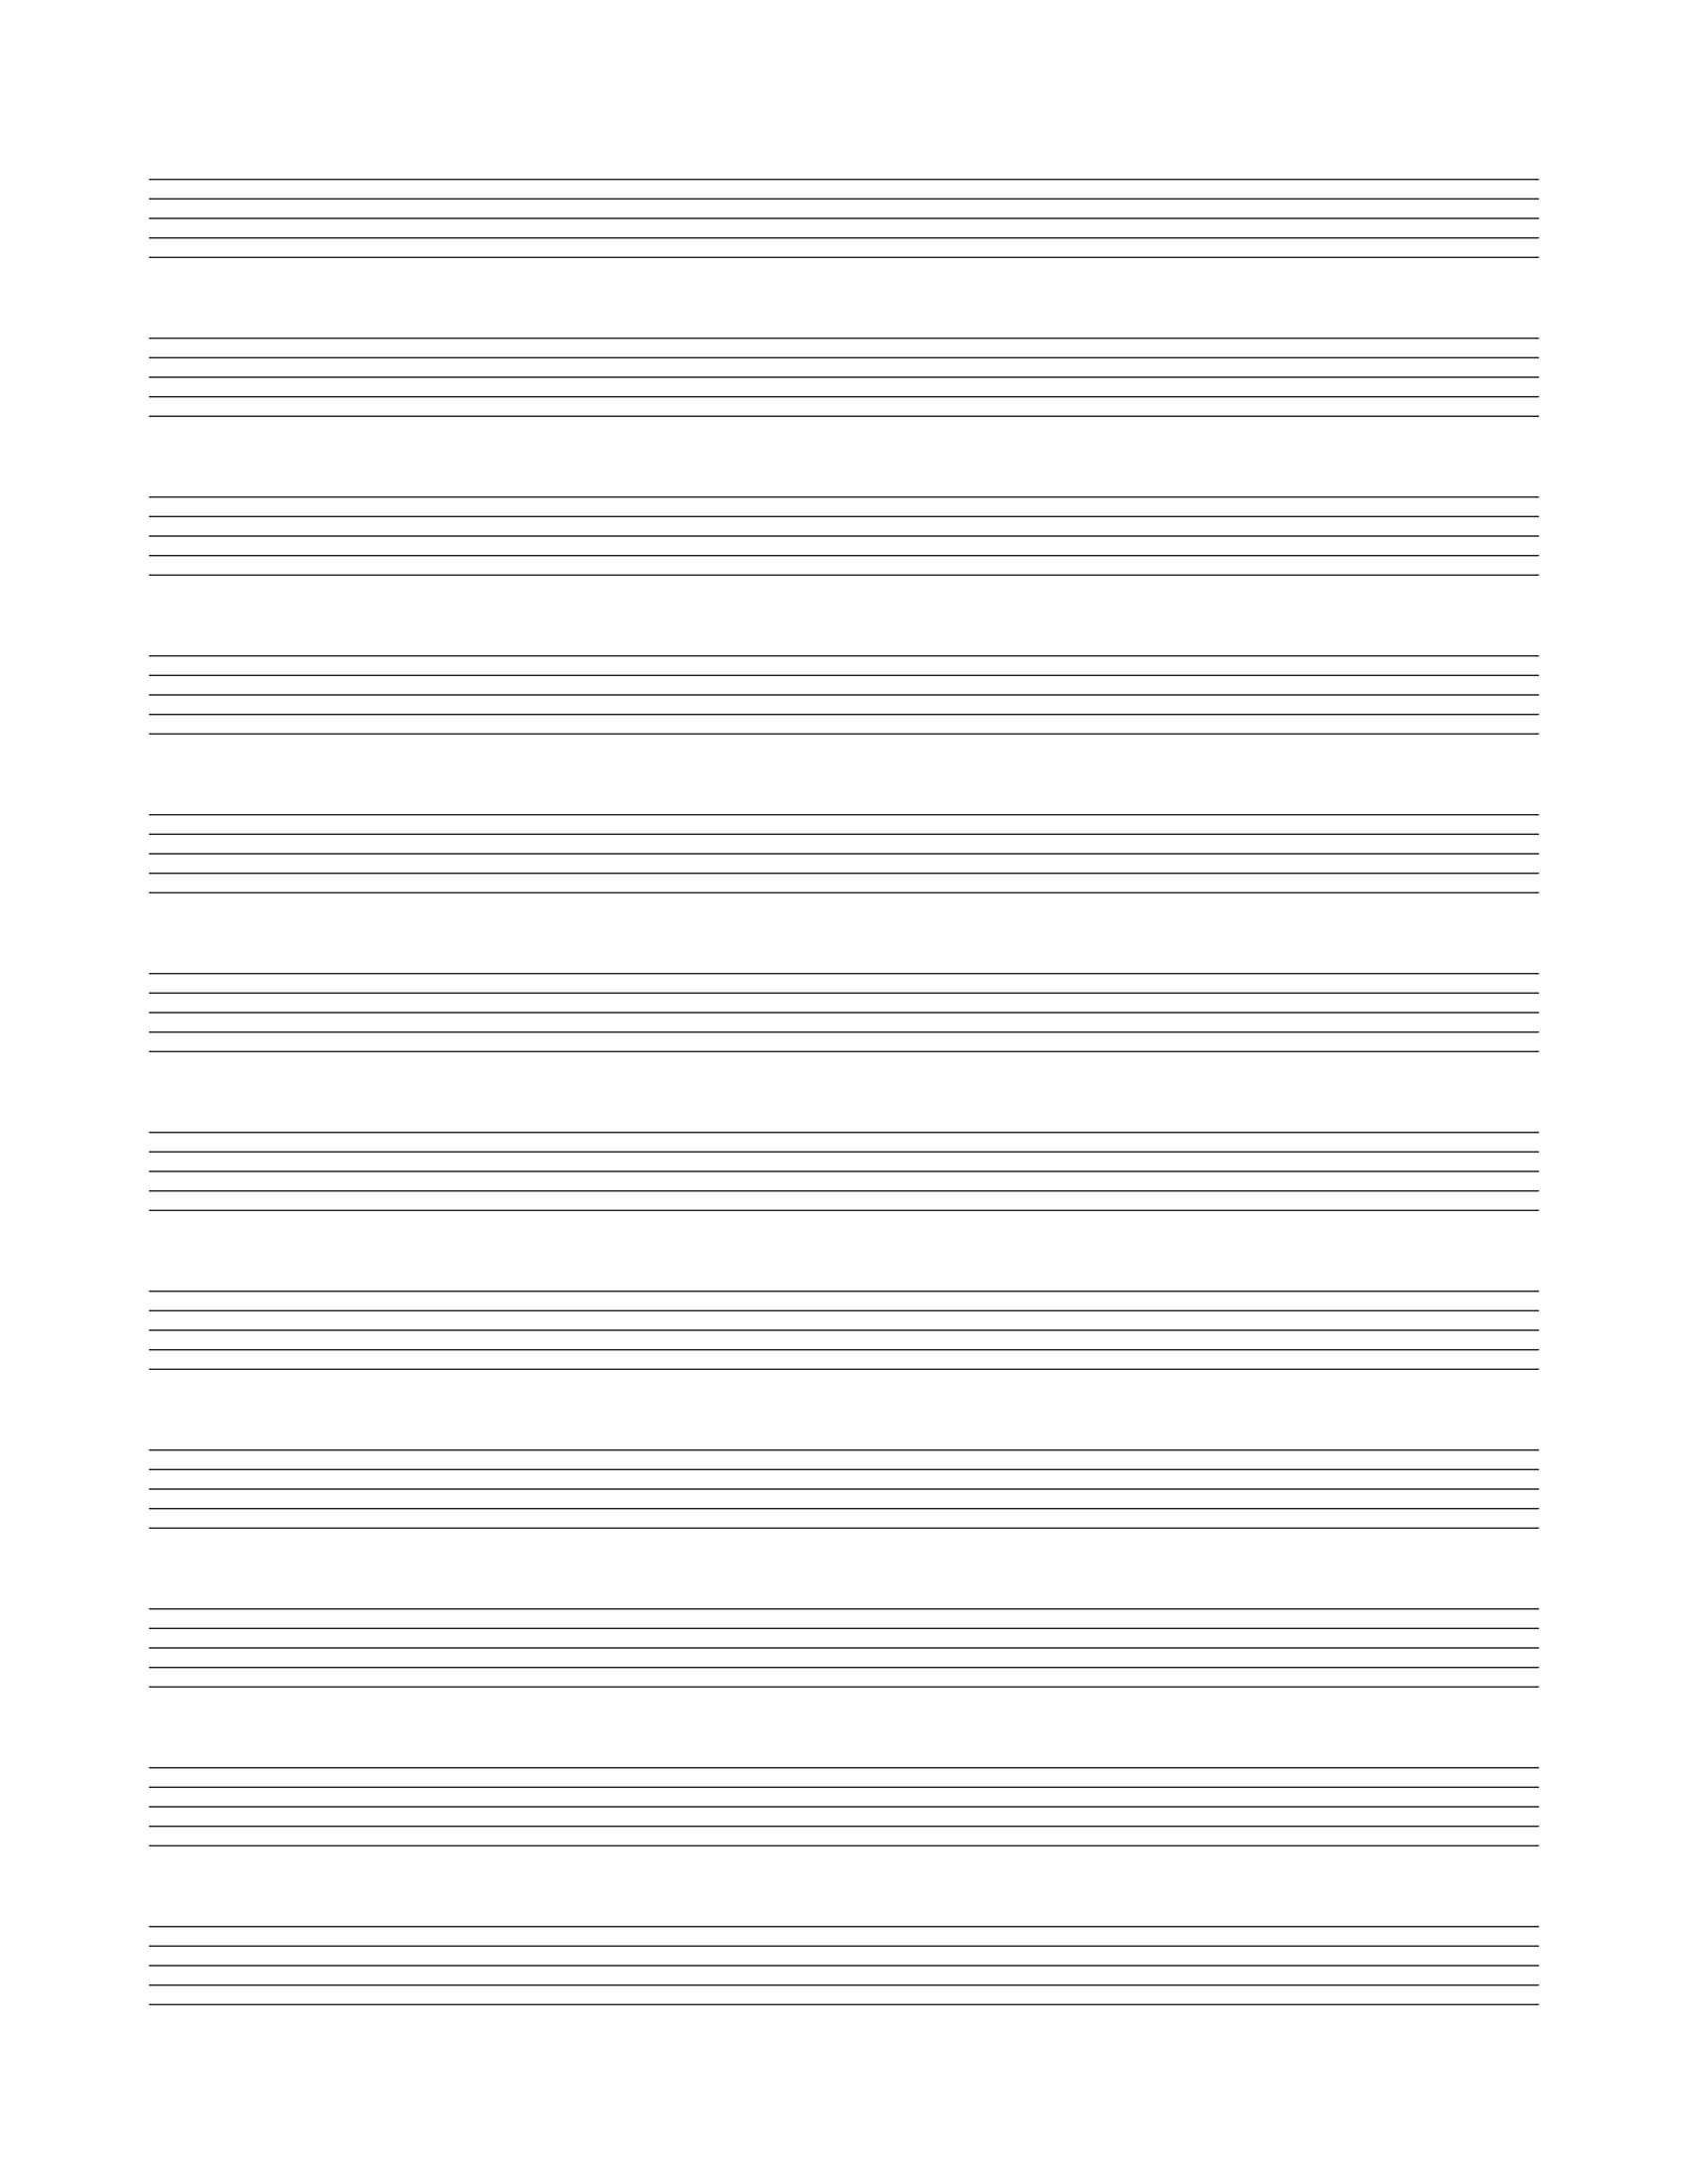 10 stave manuscript paper